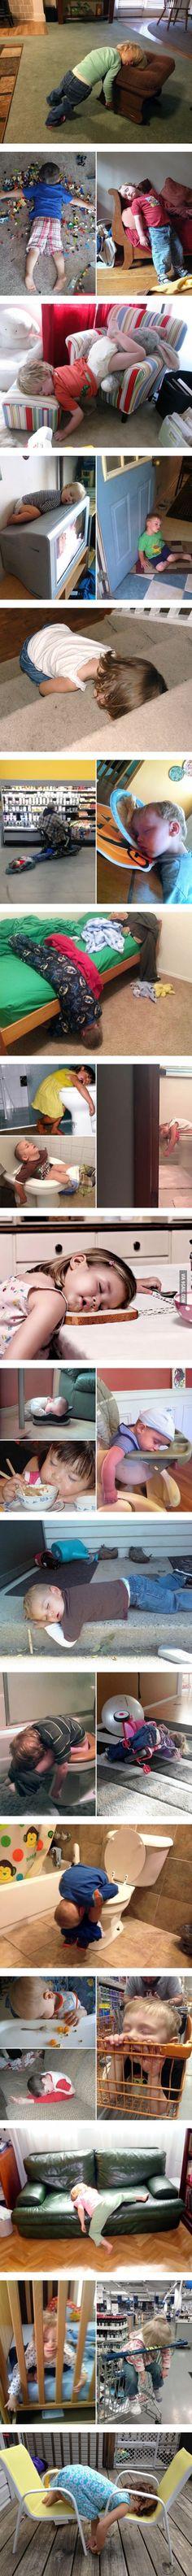 Kids can fall asleep anywhere